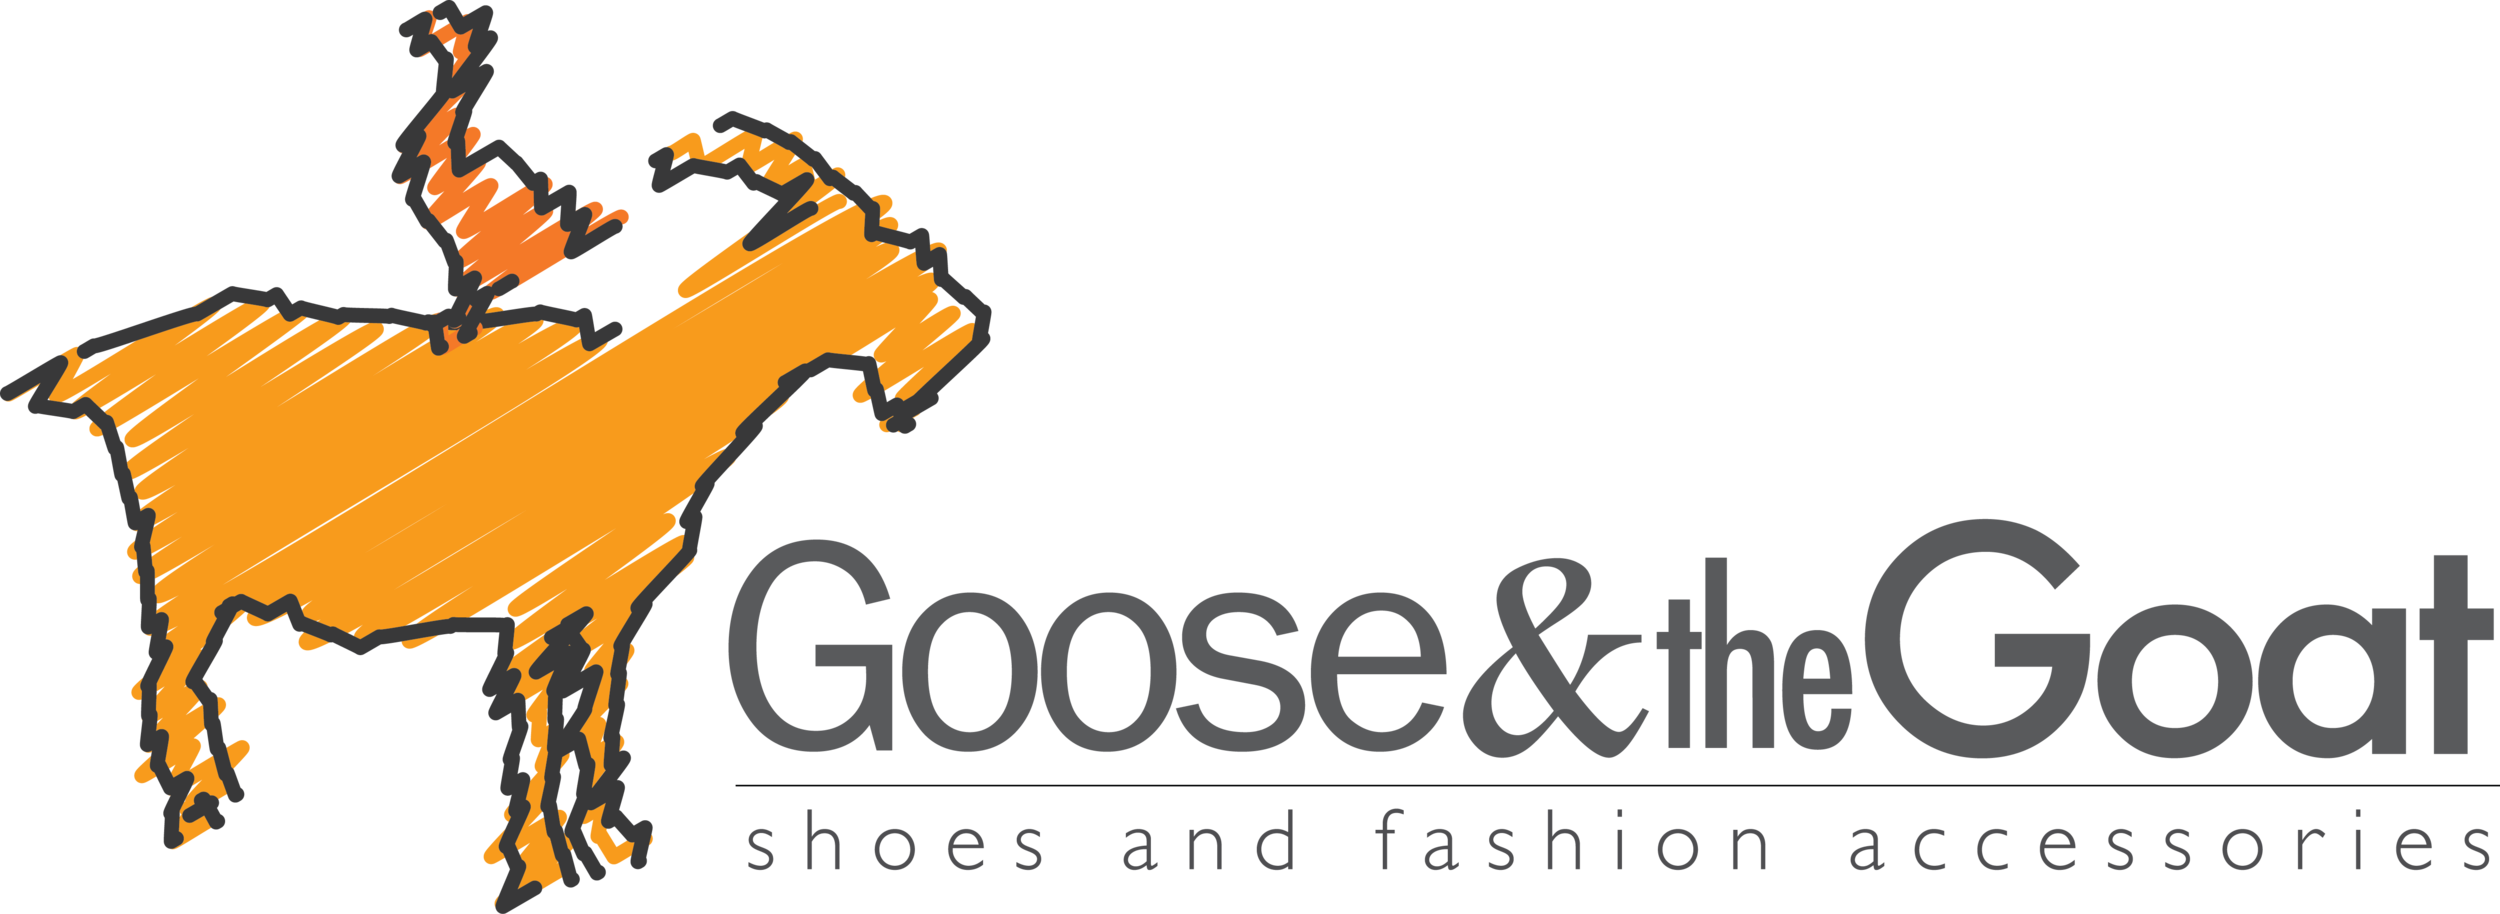 gooselogo.png